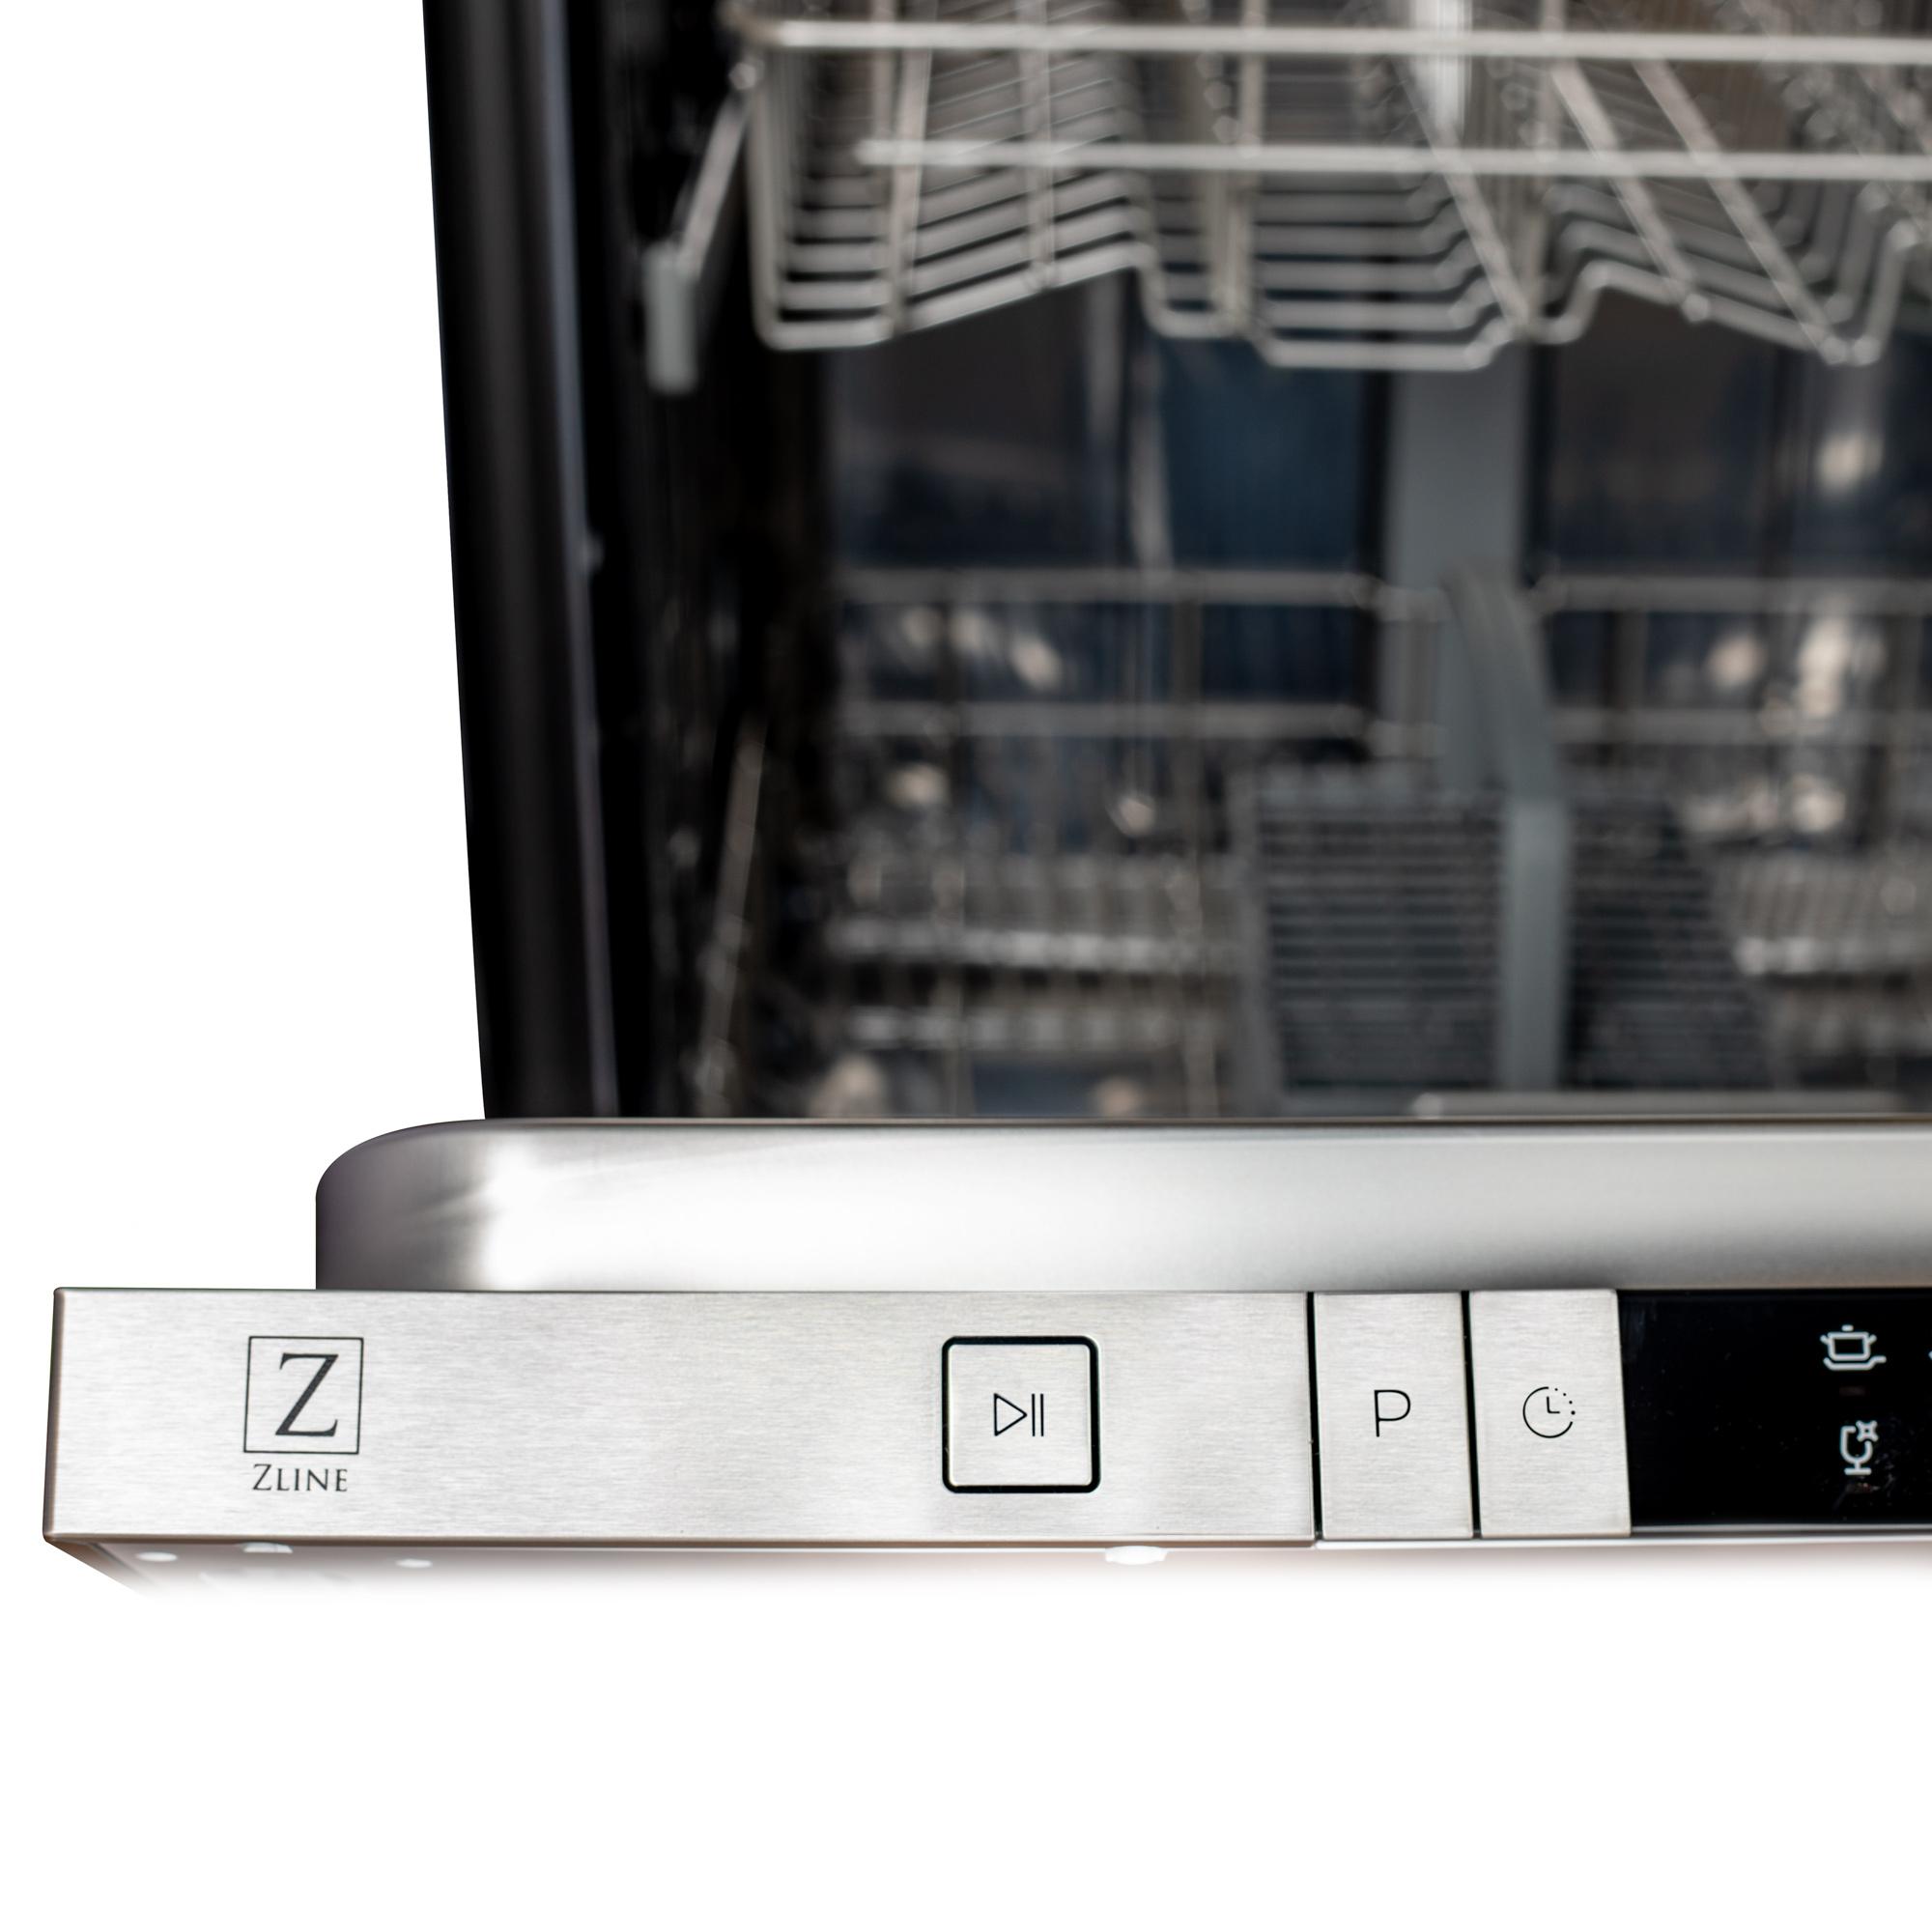 zline-panel-ready-dishwasher-copper-dw-c-24-closeup copy 2.jpg